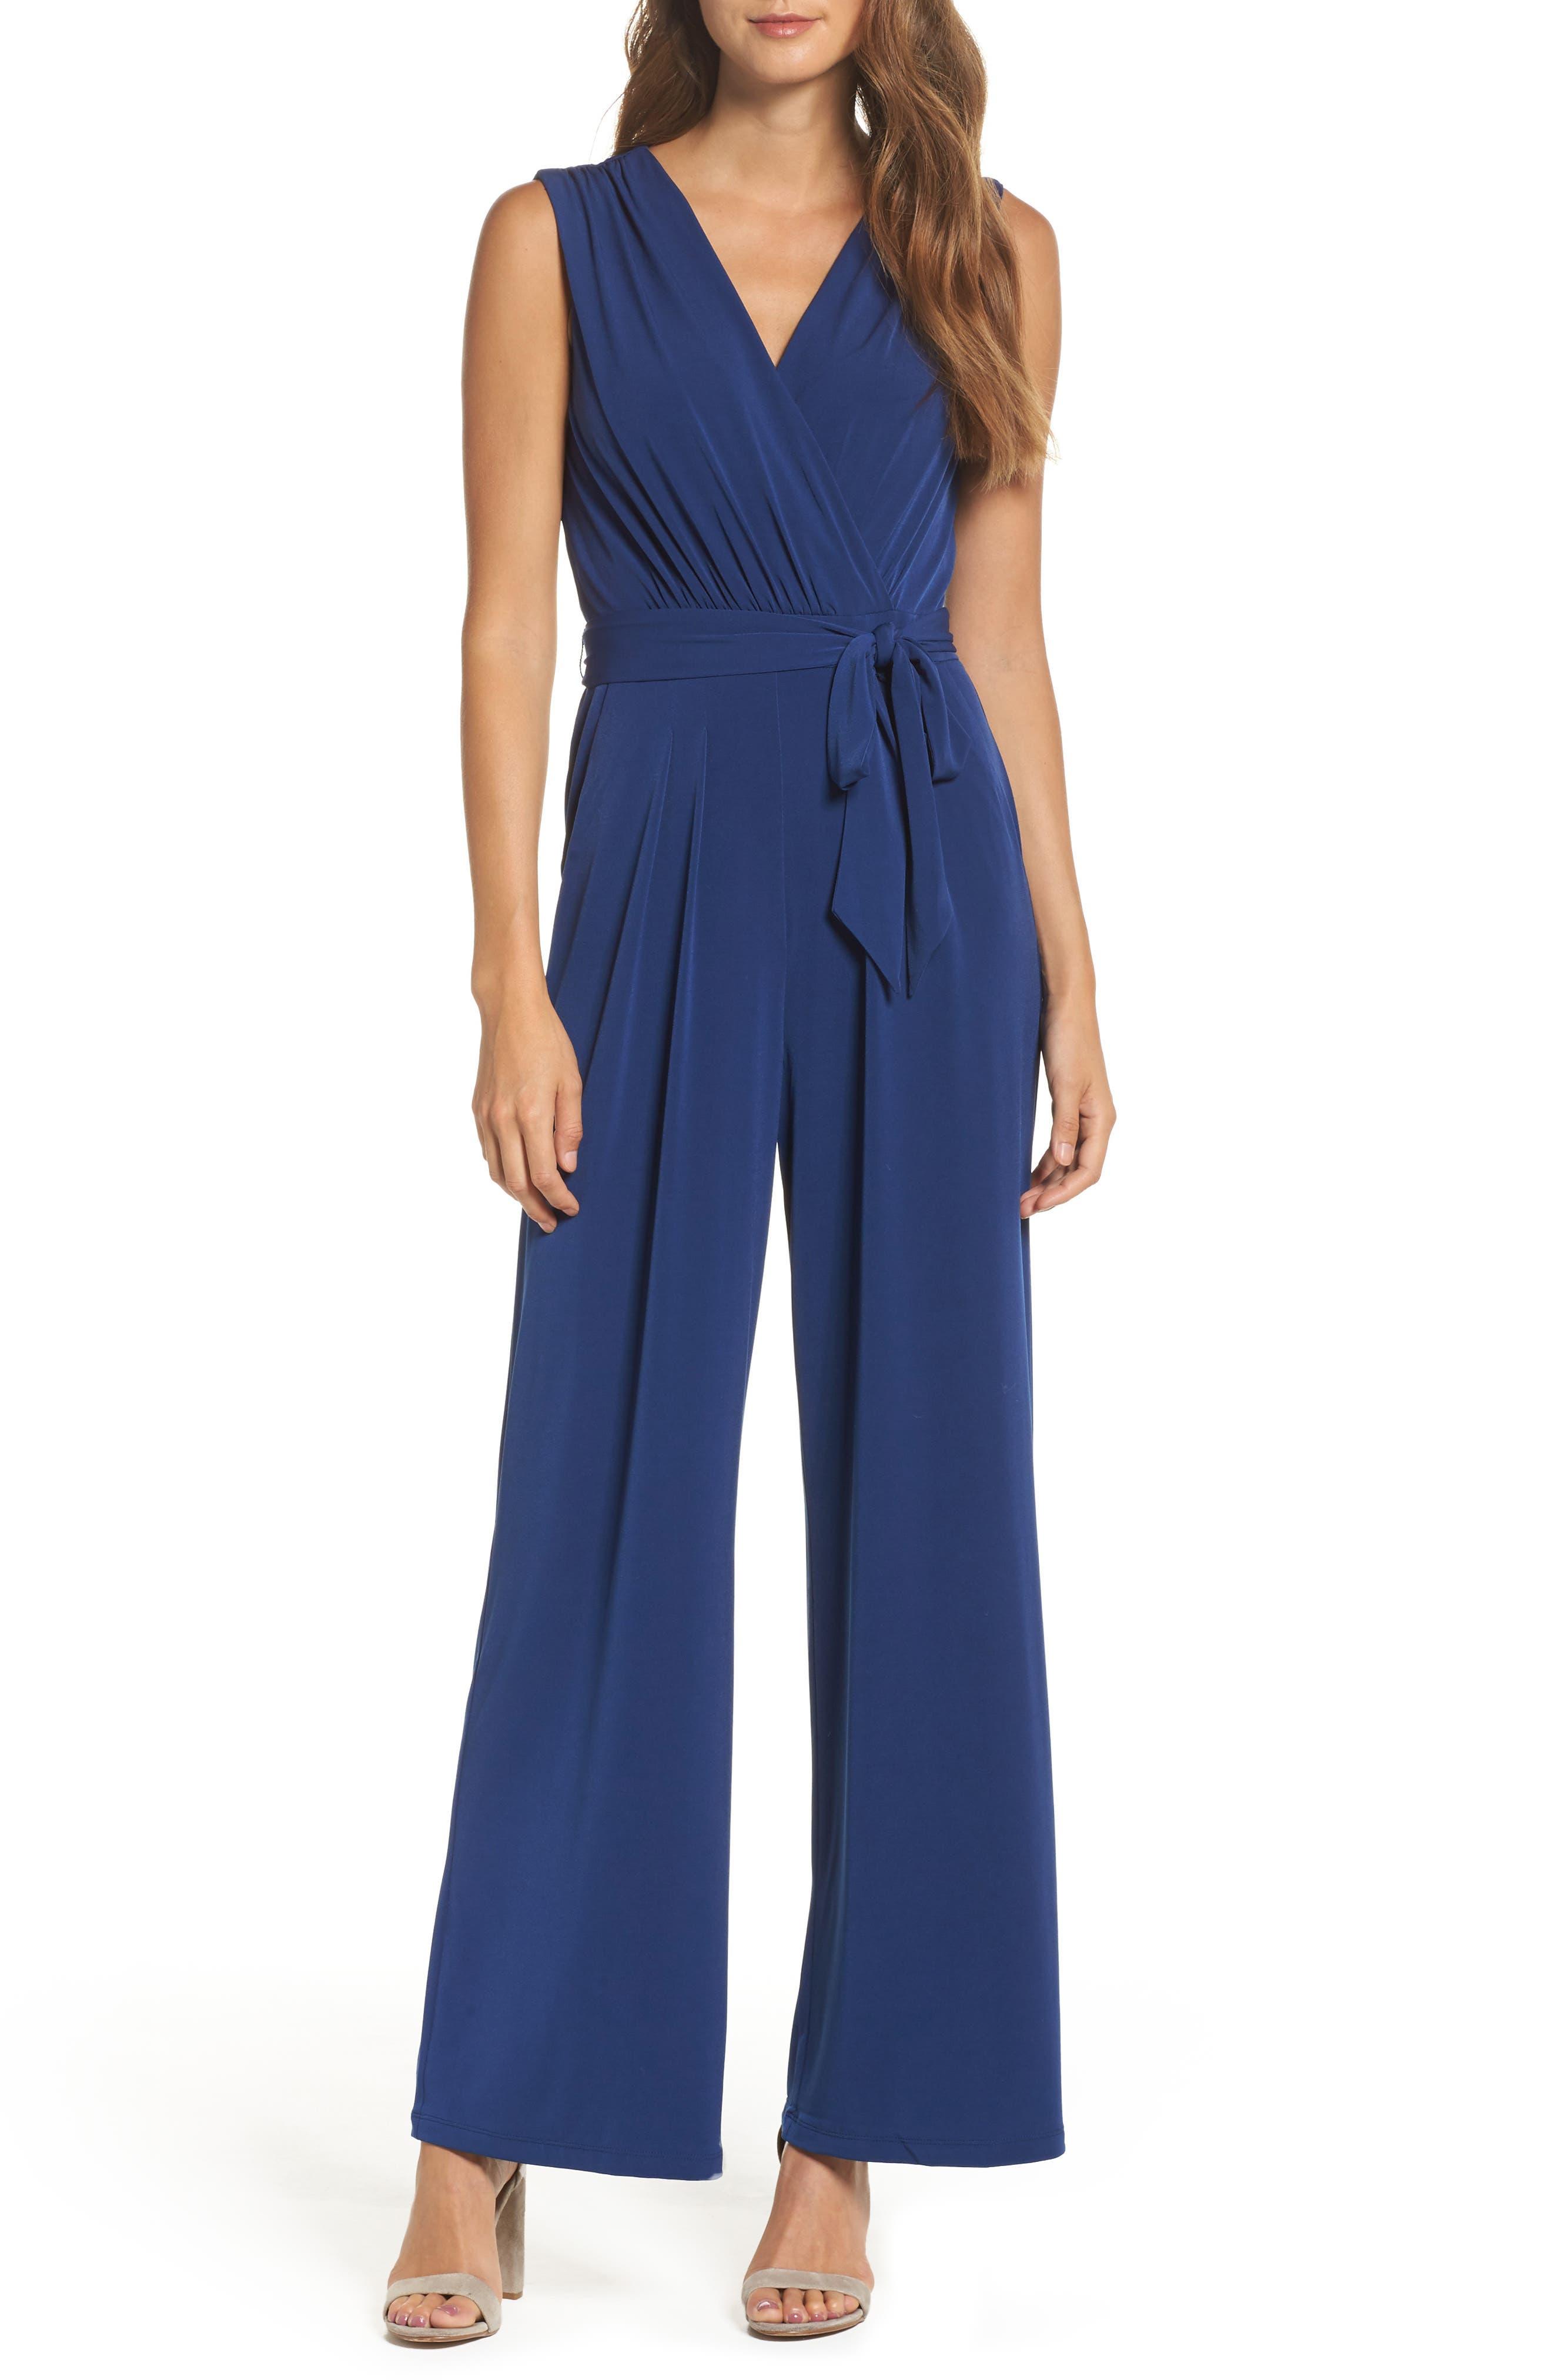 Alternate Image 1 Selected - Vince Camuto Faux Wrap Jersey Jumpsuit (Regular & Petite)